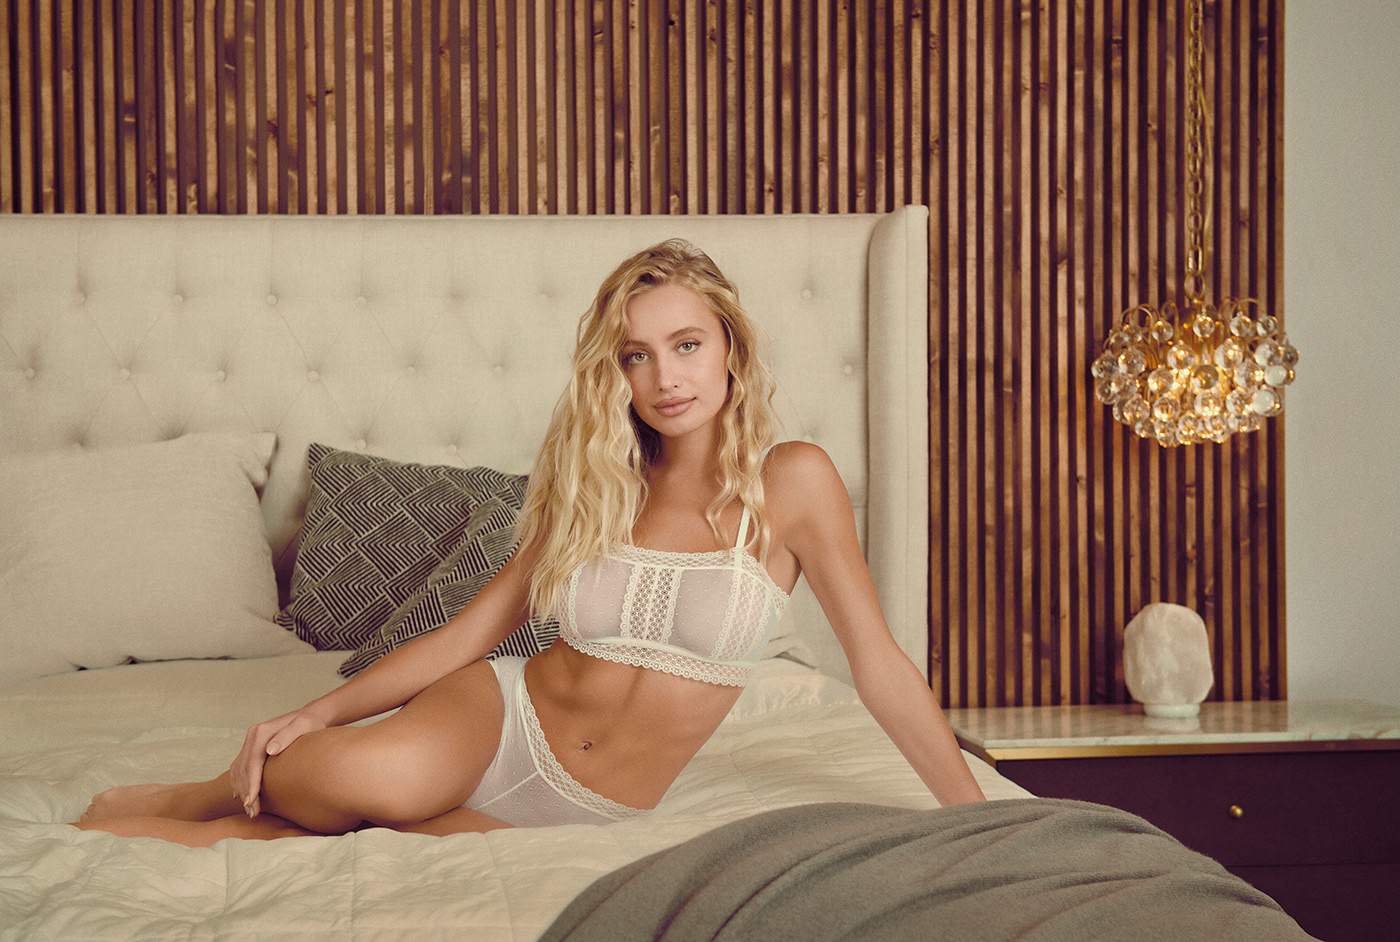 apparel beauty clothes Clothing Fashion  merchandise model retouch underwear woman